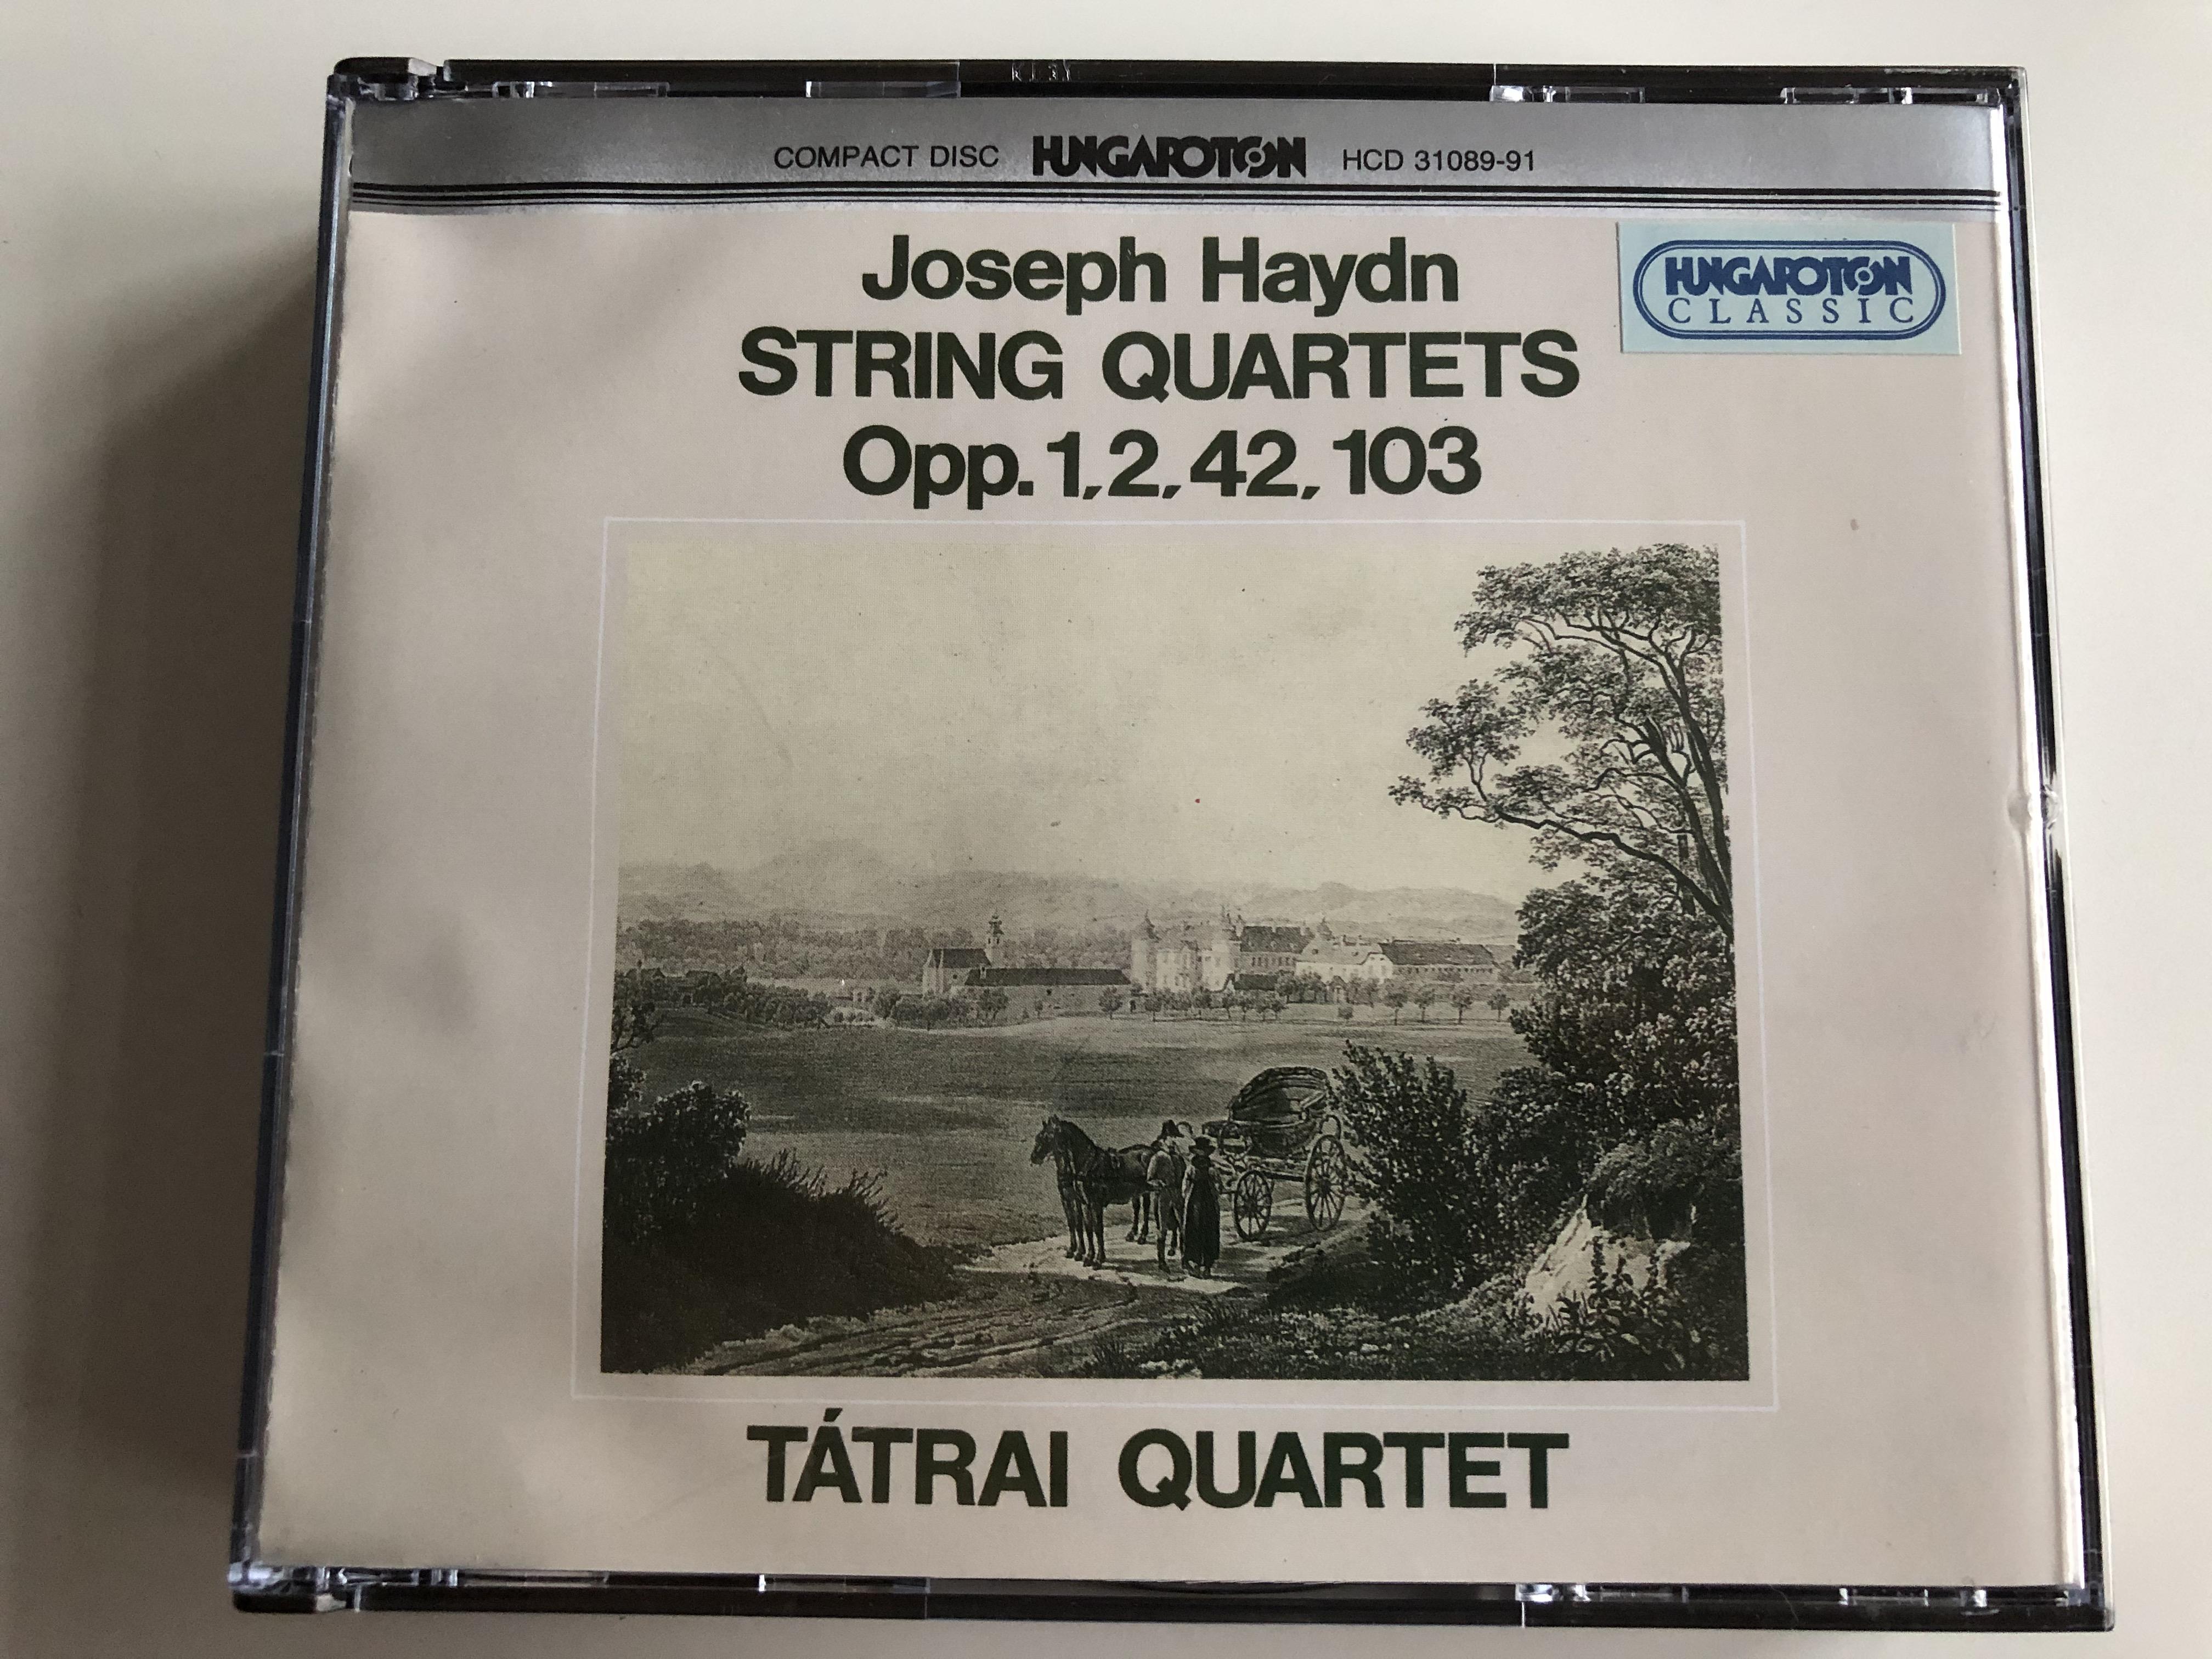 joseph-haydn-string-quartets-opp.1-2-42-103-t-trai-quartet-hungaroton-classic-3x-audio-cd-1995-stereo-hcd-31089-91-1-.jpg